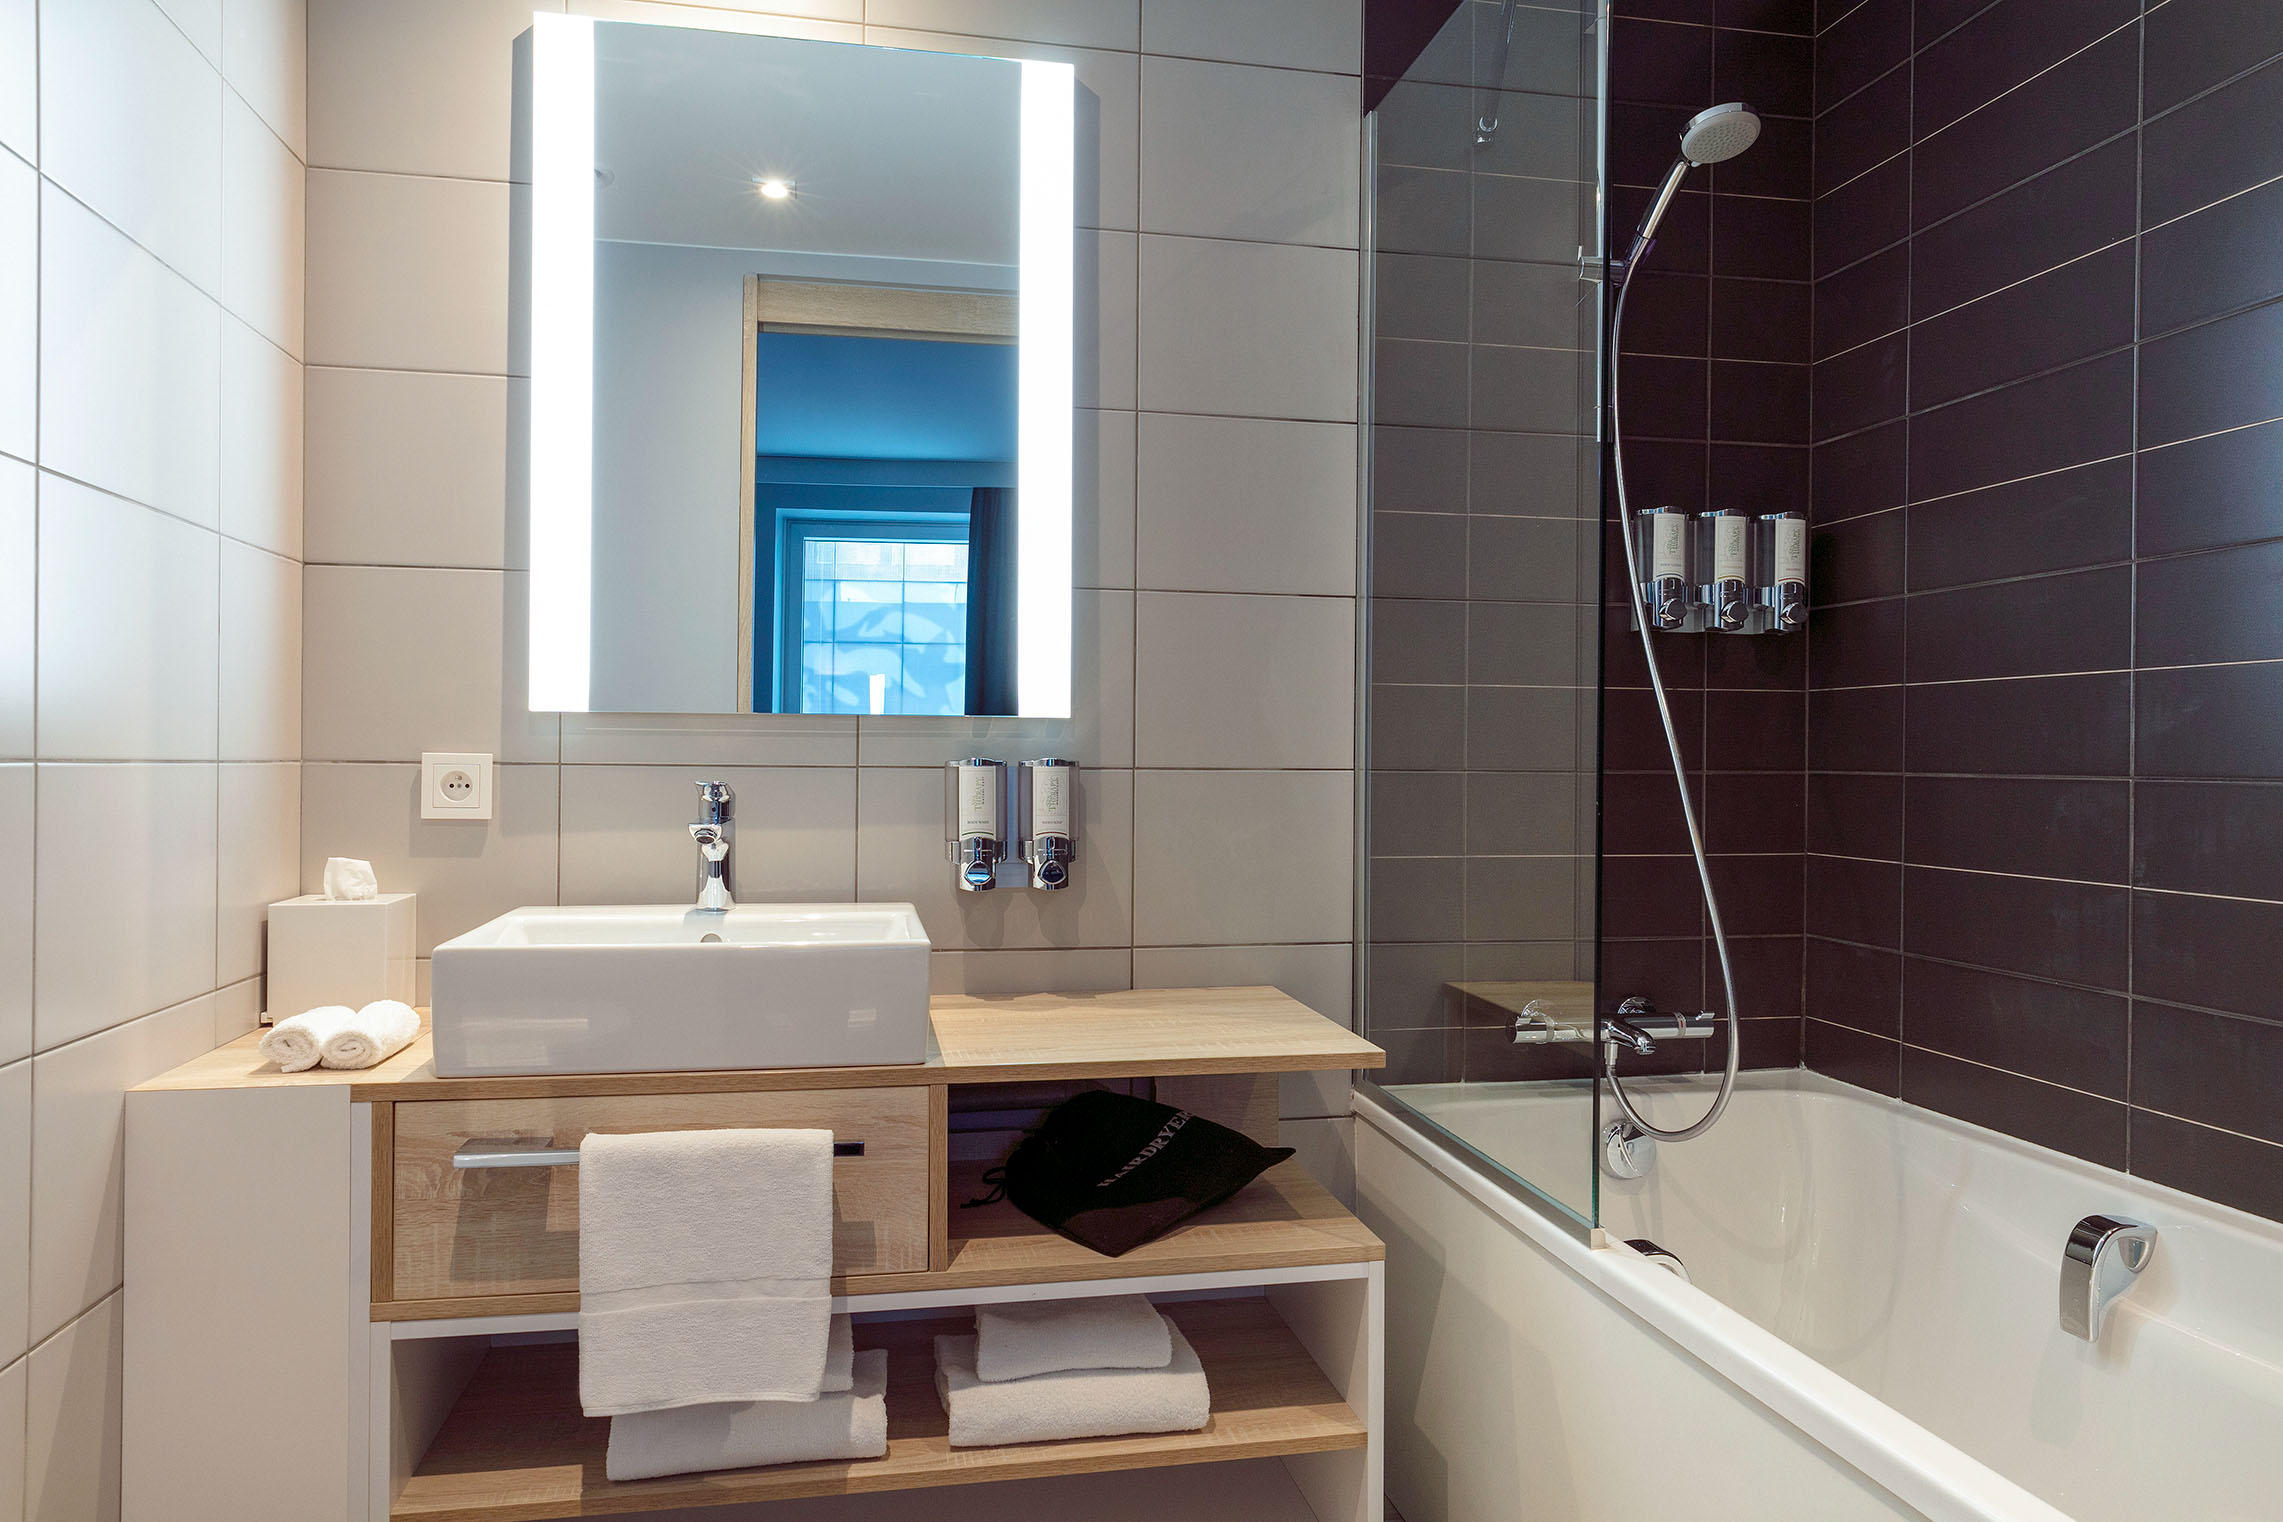 hampton-by-hilton-paris-clichy-chambre-superieure-salle-de-bain-2